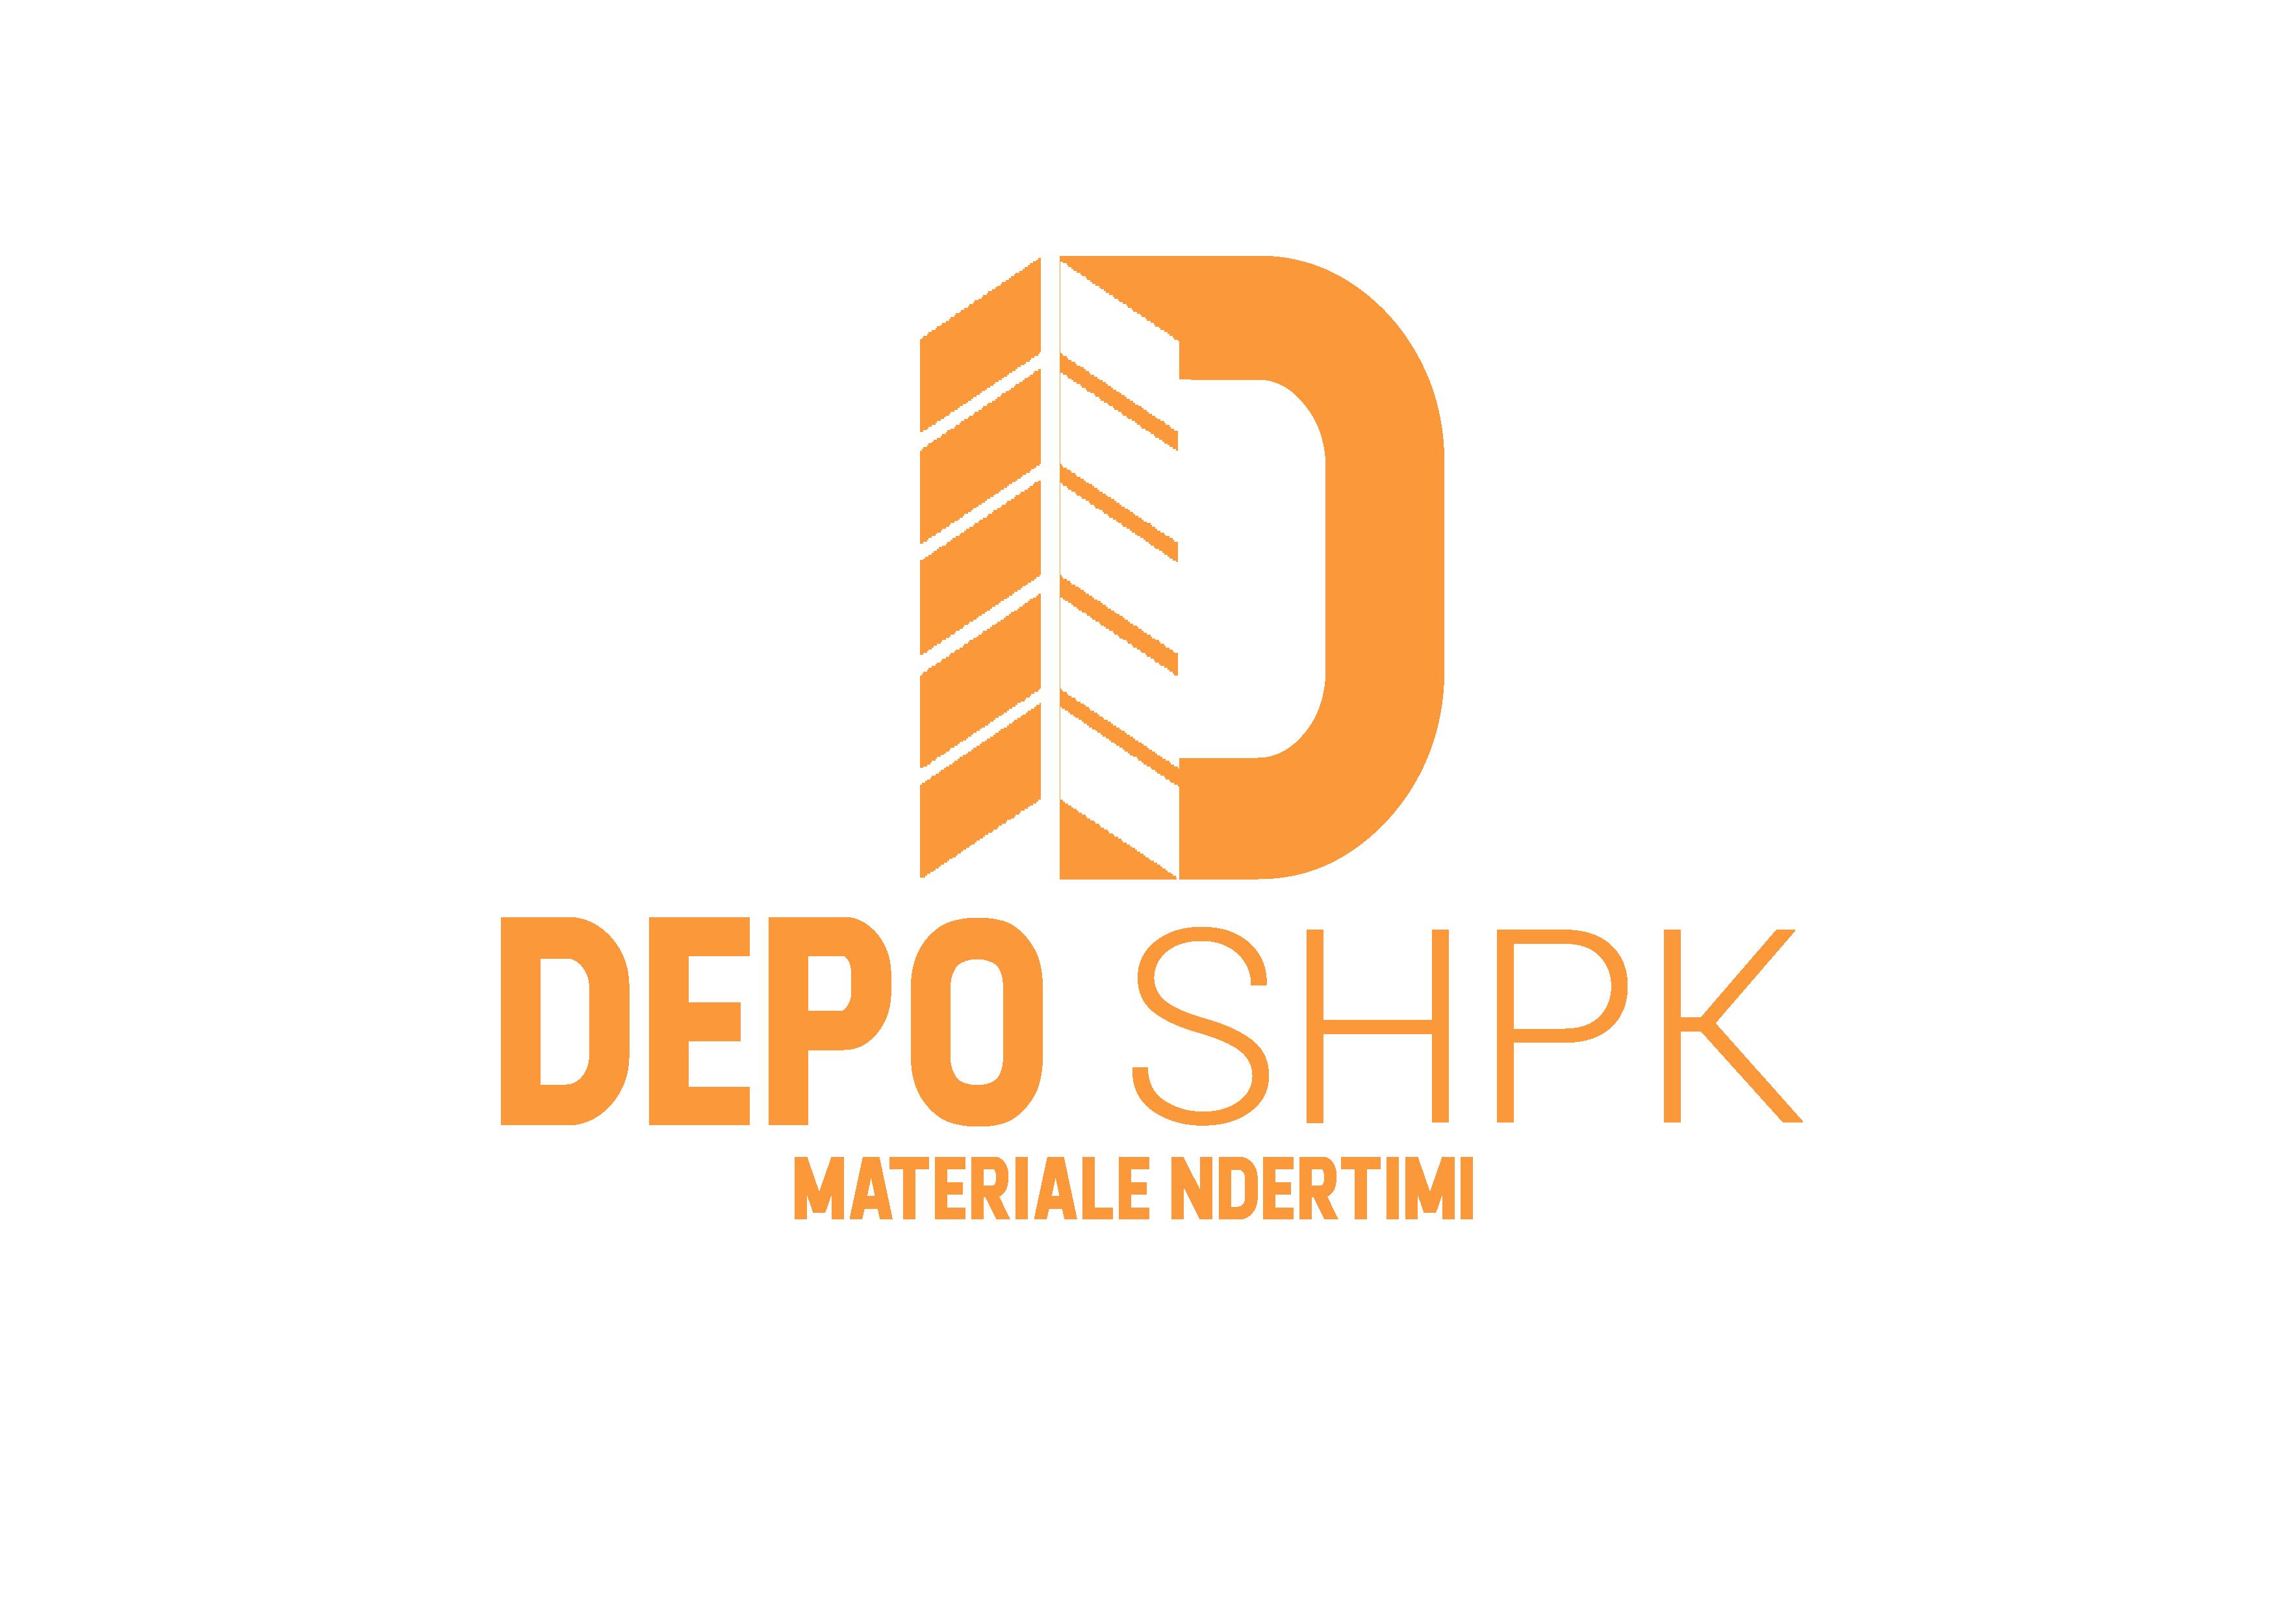 https://www.deposhpk.al/wp-content/uploads/2020/01/DEPO-LOGO-1.png